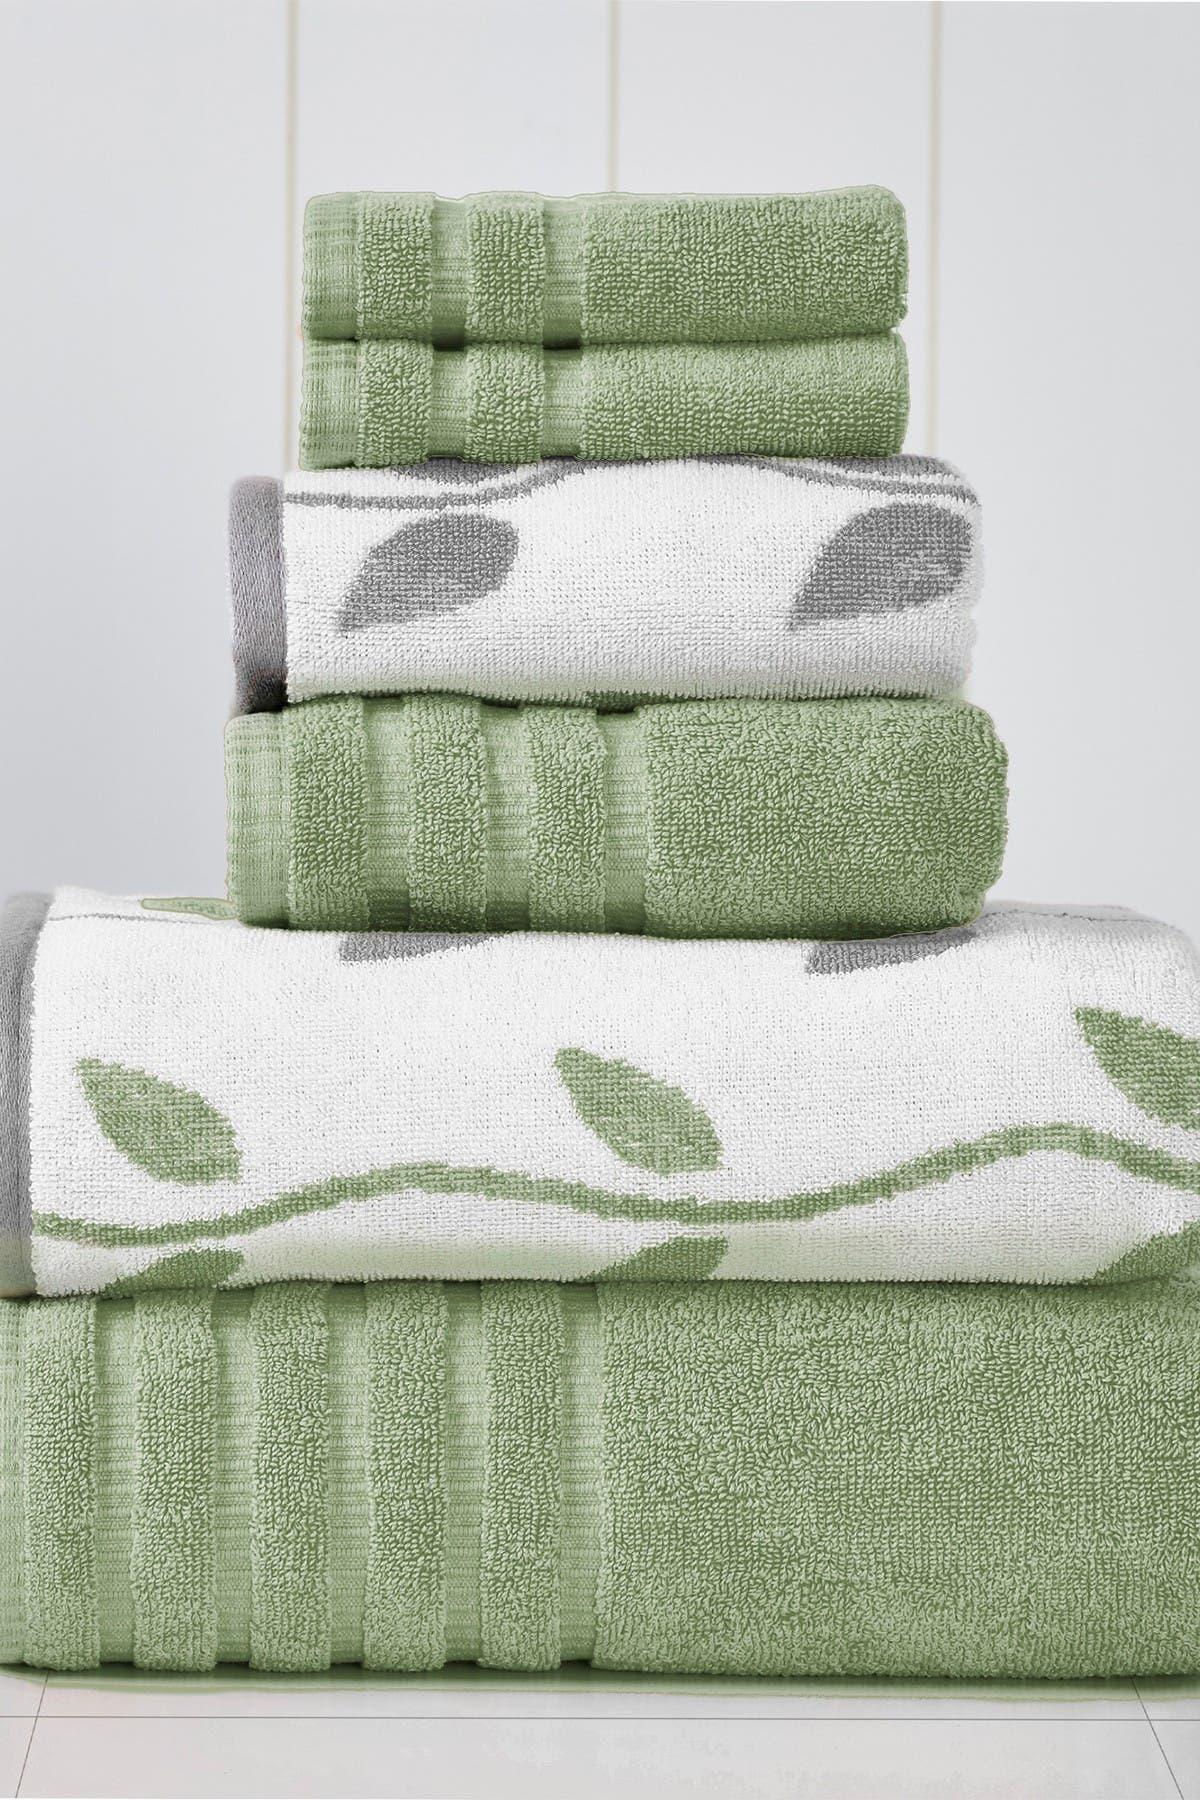 Image of Modern Threads Yard Dyed Towel 6-Piece Set - Organic Vines Sage Green